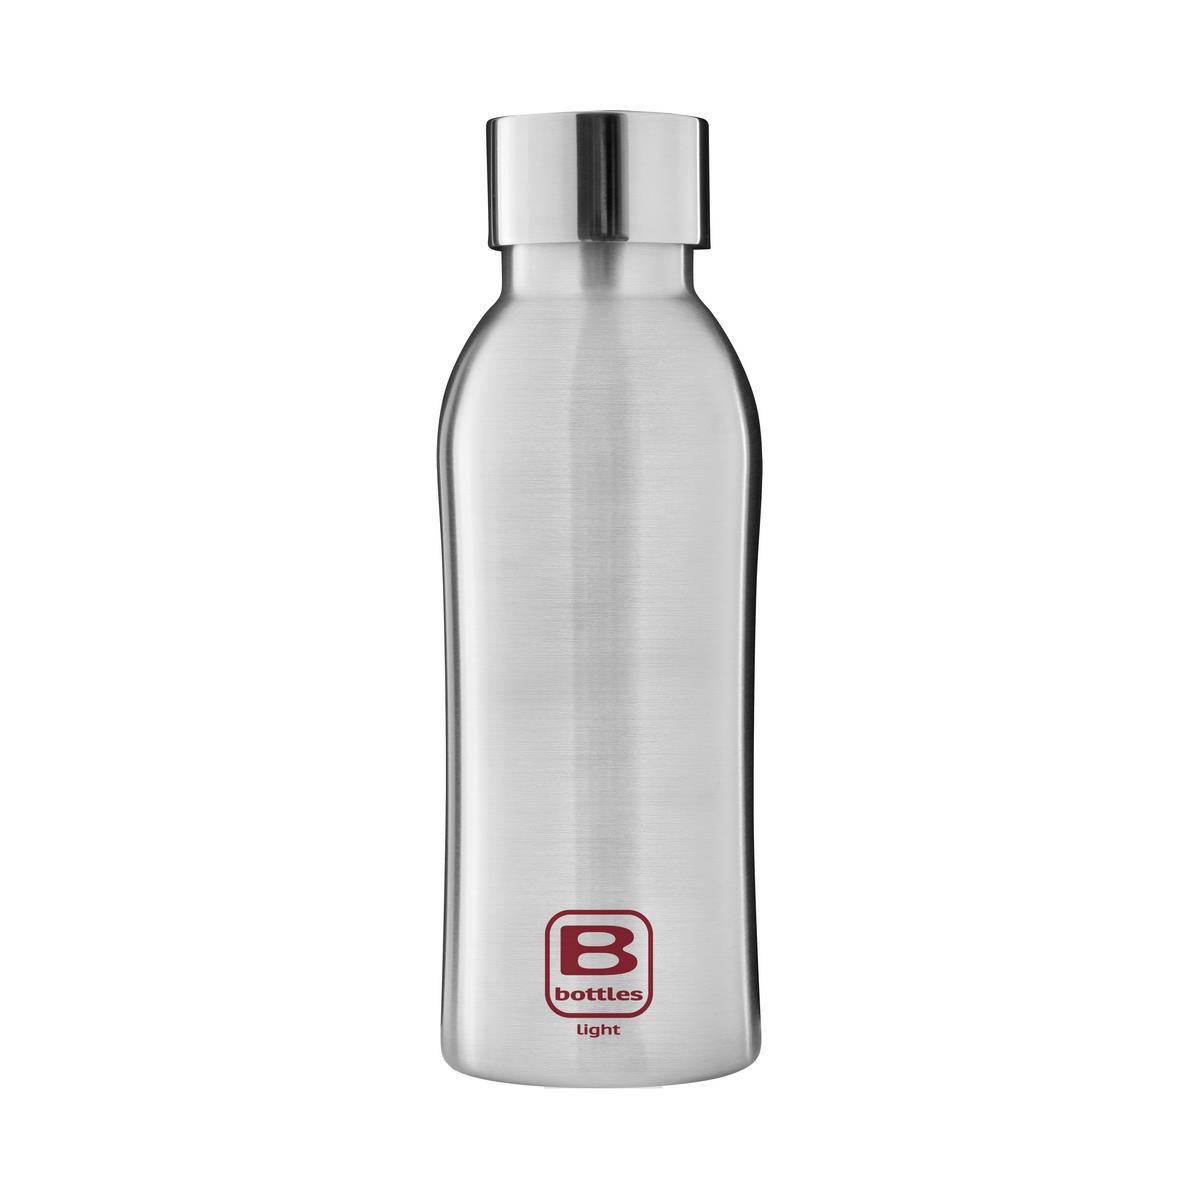 B Bottles Light - Steel Brushed - 530 ml - Bottiglia in acciaio inox 18/10 ultra leggera e compatta